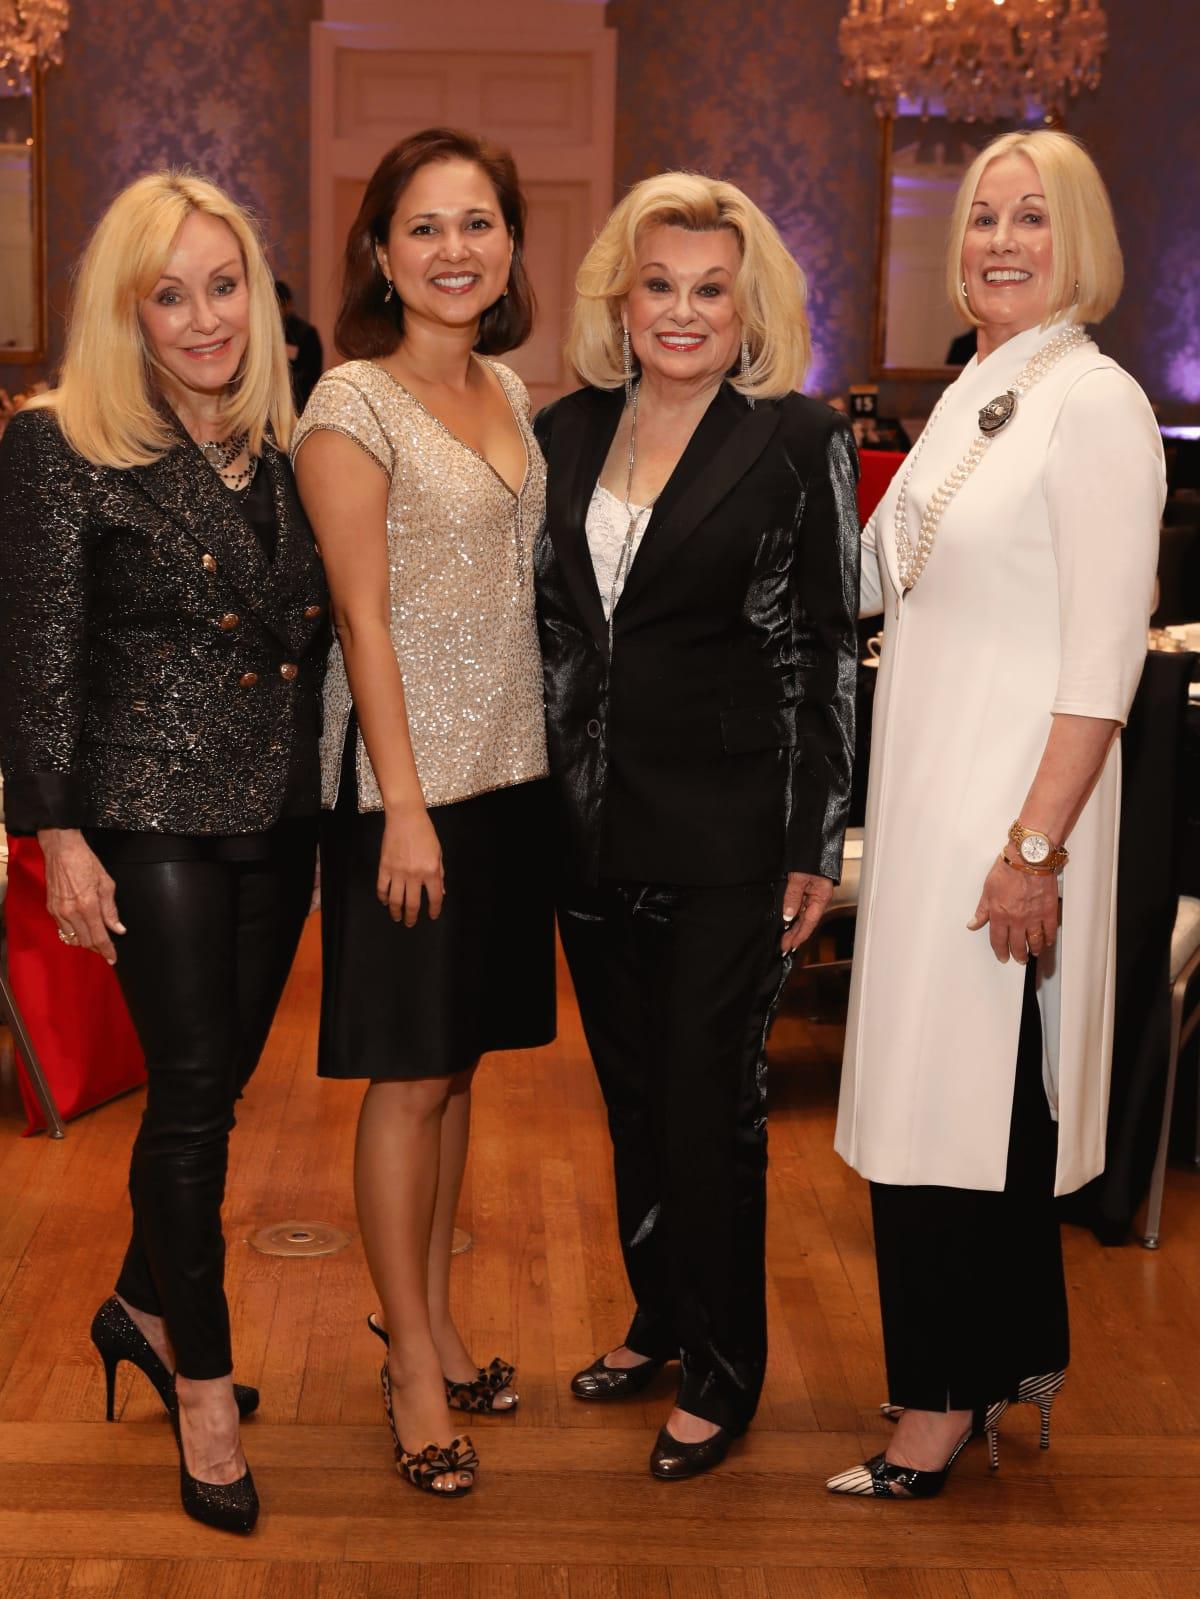 Houston, Barc Foundation's Barc On Broadway ball, Oct 2016, Judi McGee, Elizabeth Brock, Sidney Faust, Elsie Eckert